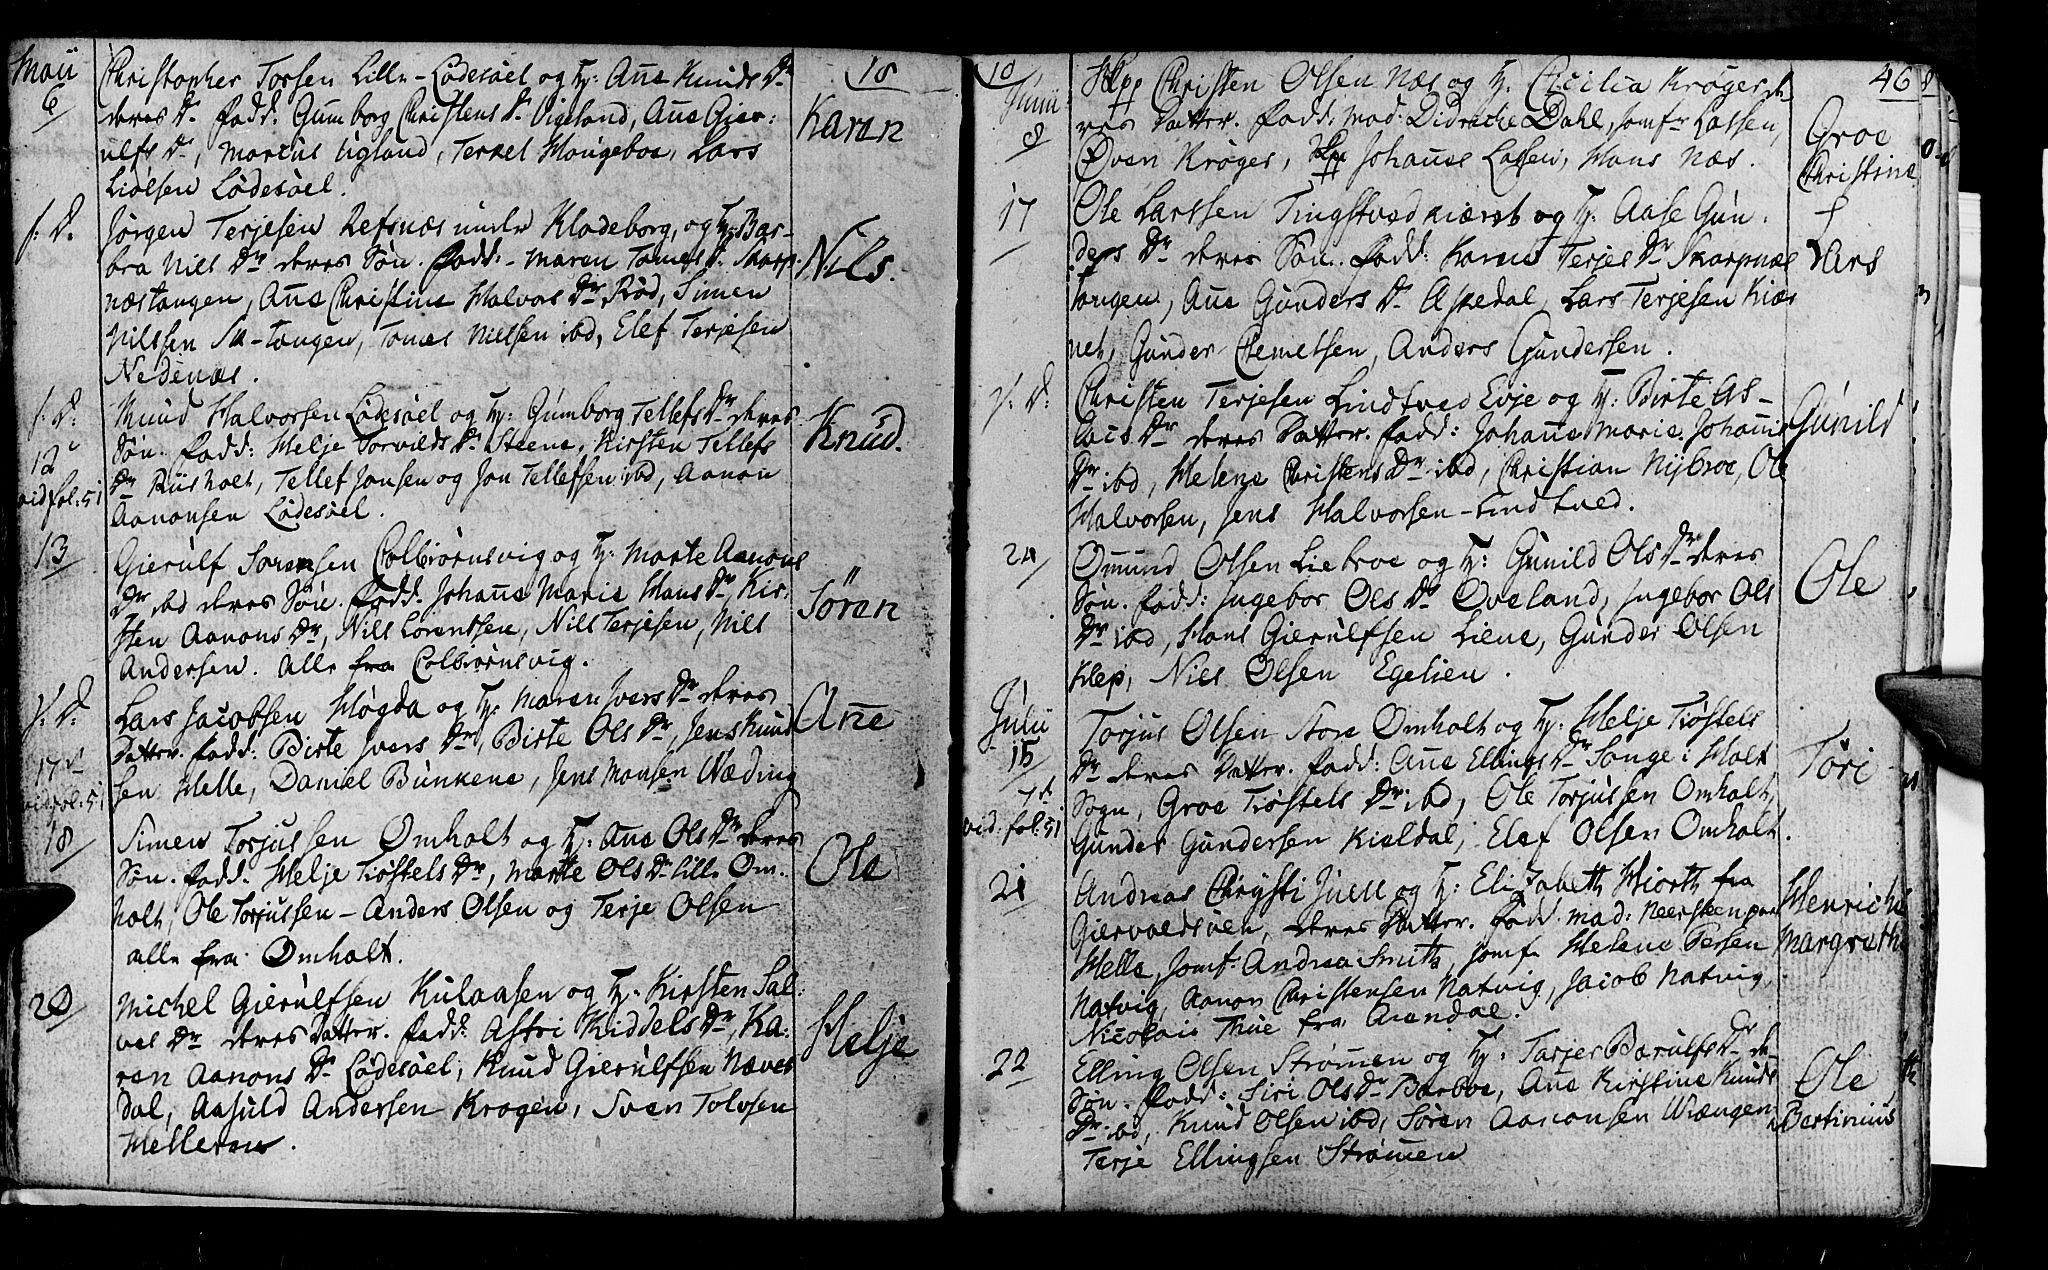 SAK, Øyestad sokneprestkontor, F/Fa/L0011: Ministerialbok nr. A 11, 1805-1824, s. 46